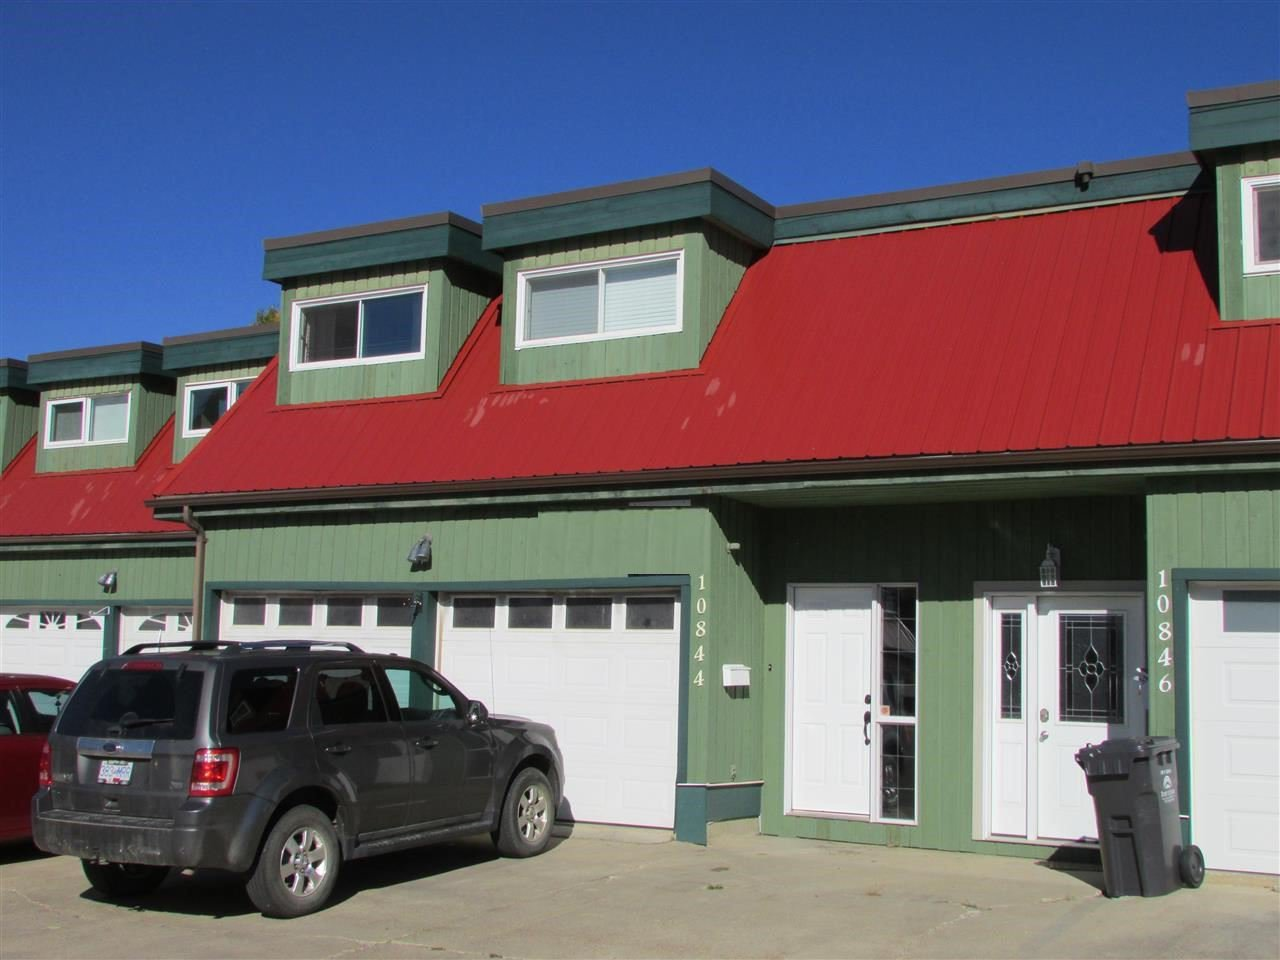 "Main Photo: 10844 102 Street in Fort St. John: Fort St. John - City NW Townhouse for sale in ""CEDAR VILLAGE"" (Fort St. John (Zone 60))  : MLS®# R2434020"